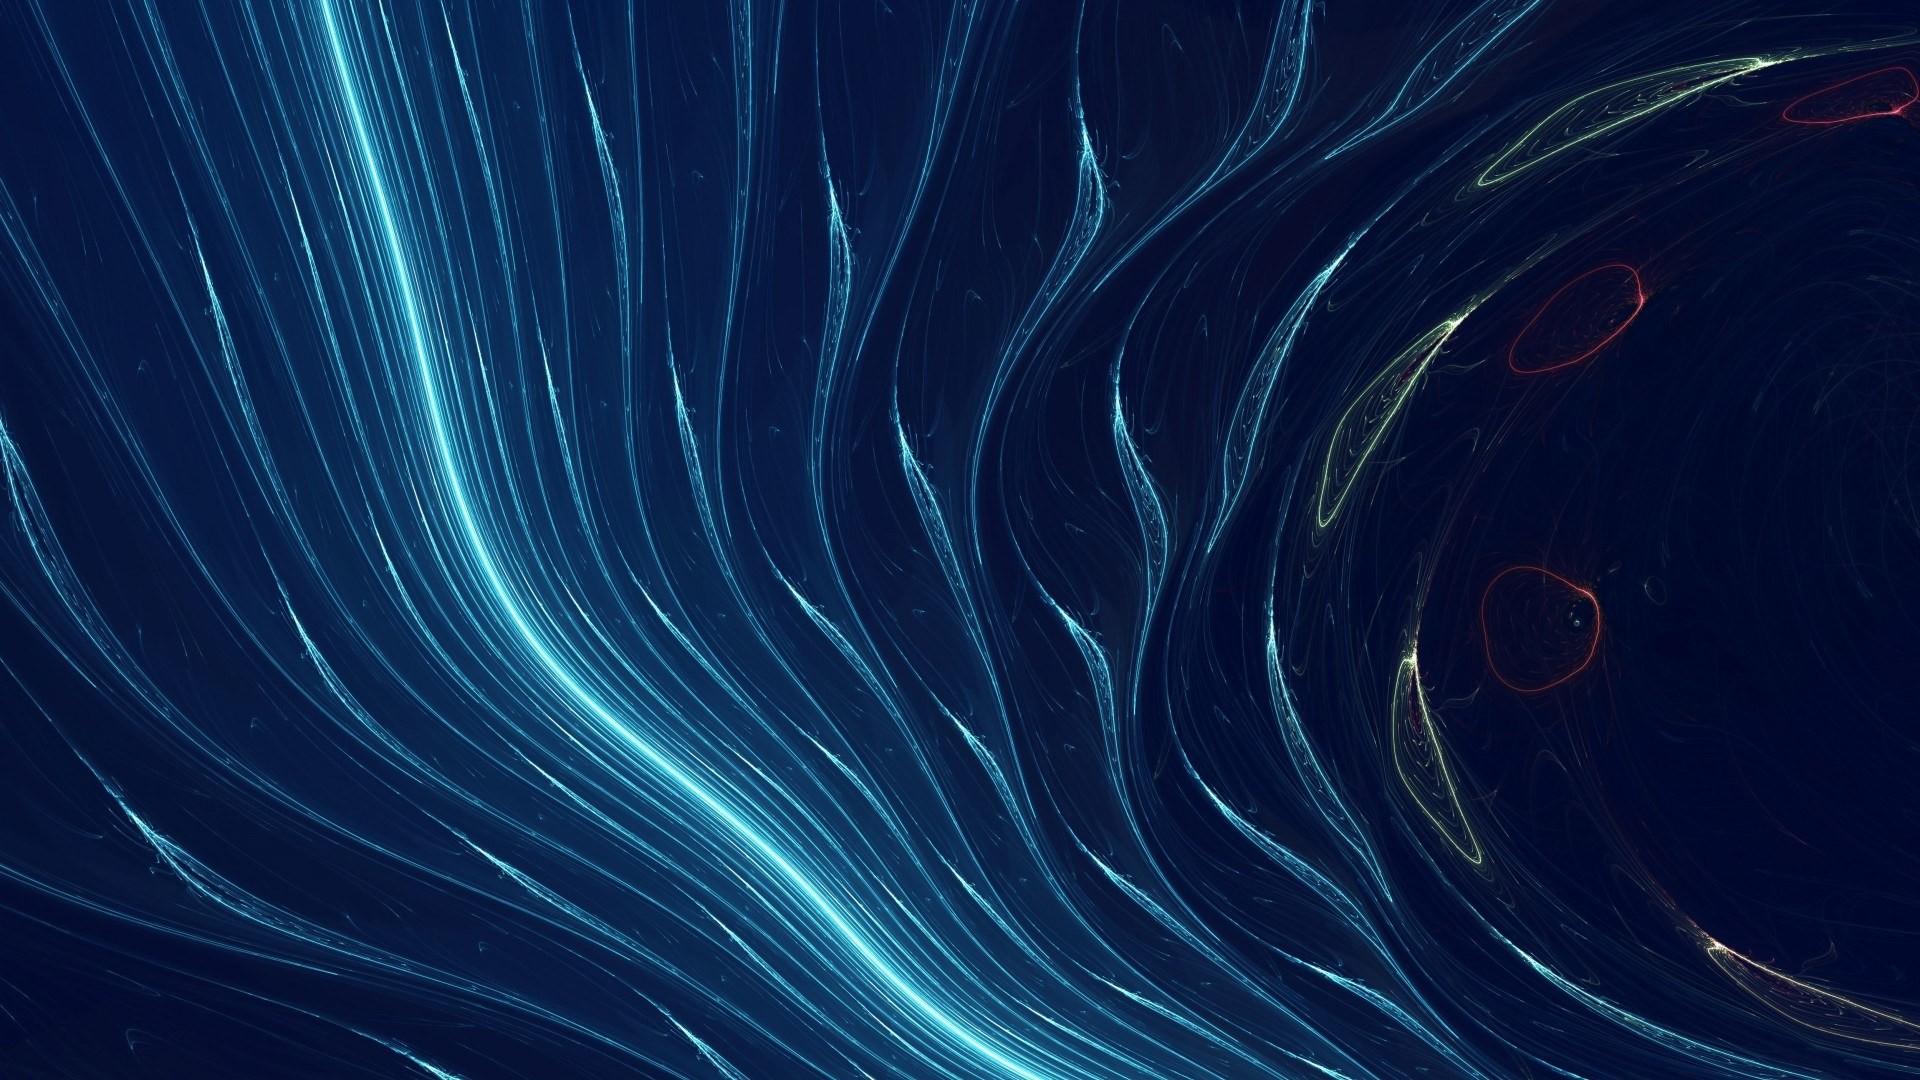 General 1920x1080 digital art abstract lines blue background neon smoke cyan